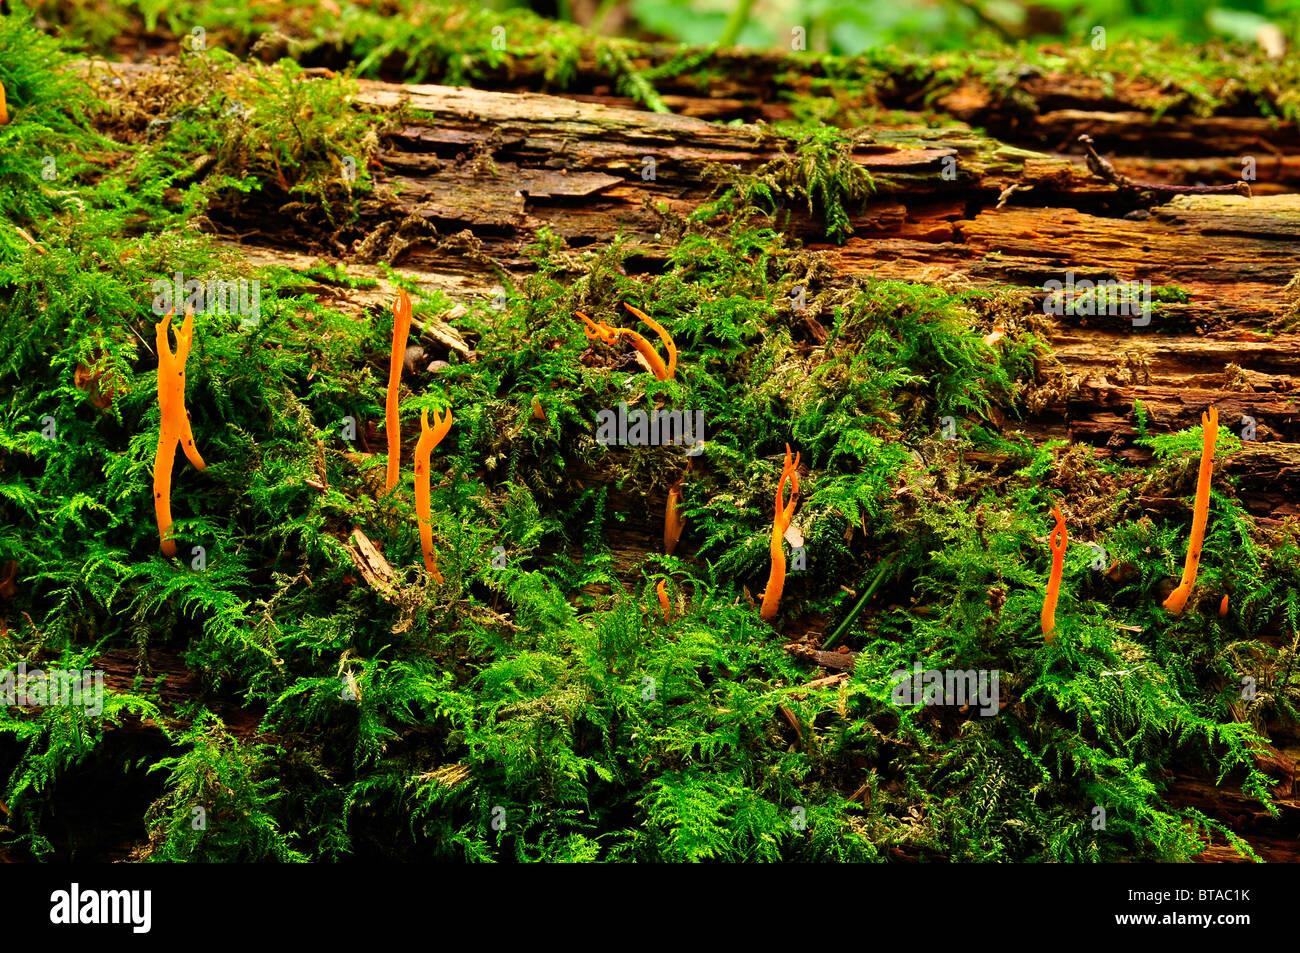 Yellow Stagshorn fungus in Putteridge Bury, Luton, England - Stock Image